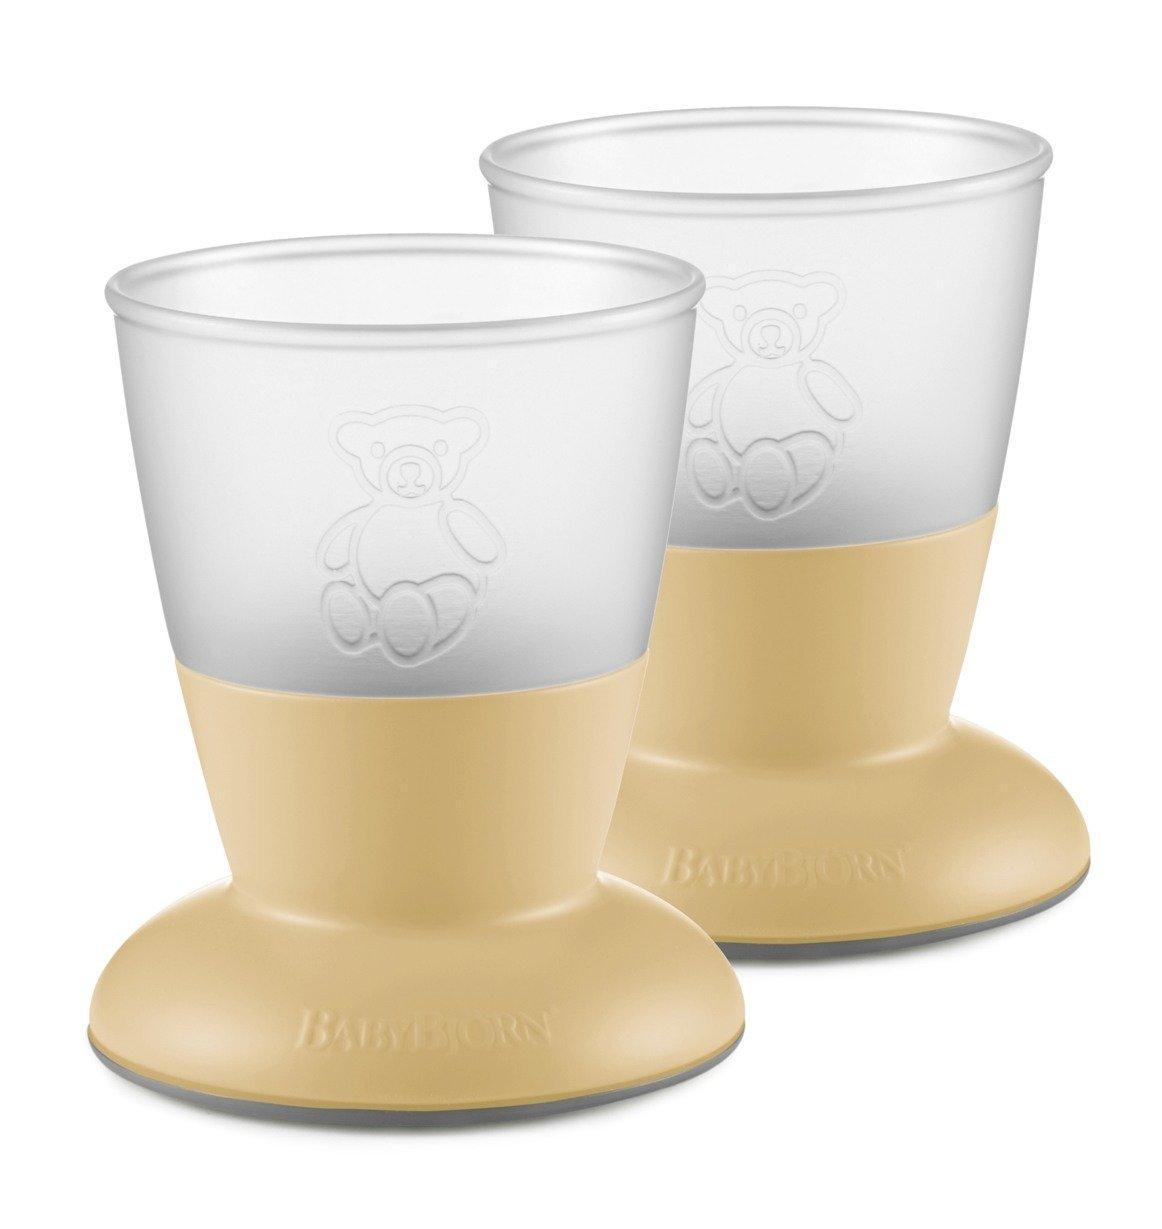 Две чашки BabyBjorn, Powder Yellow